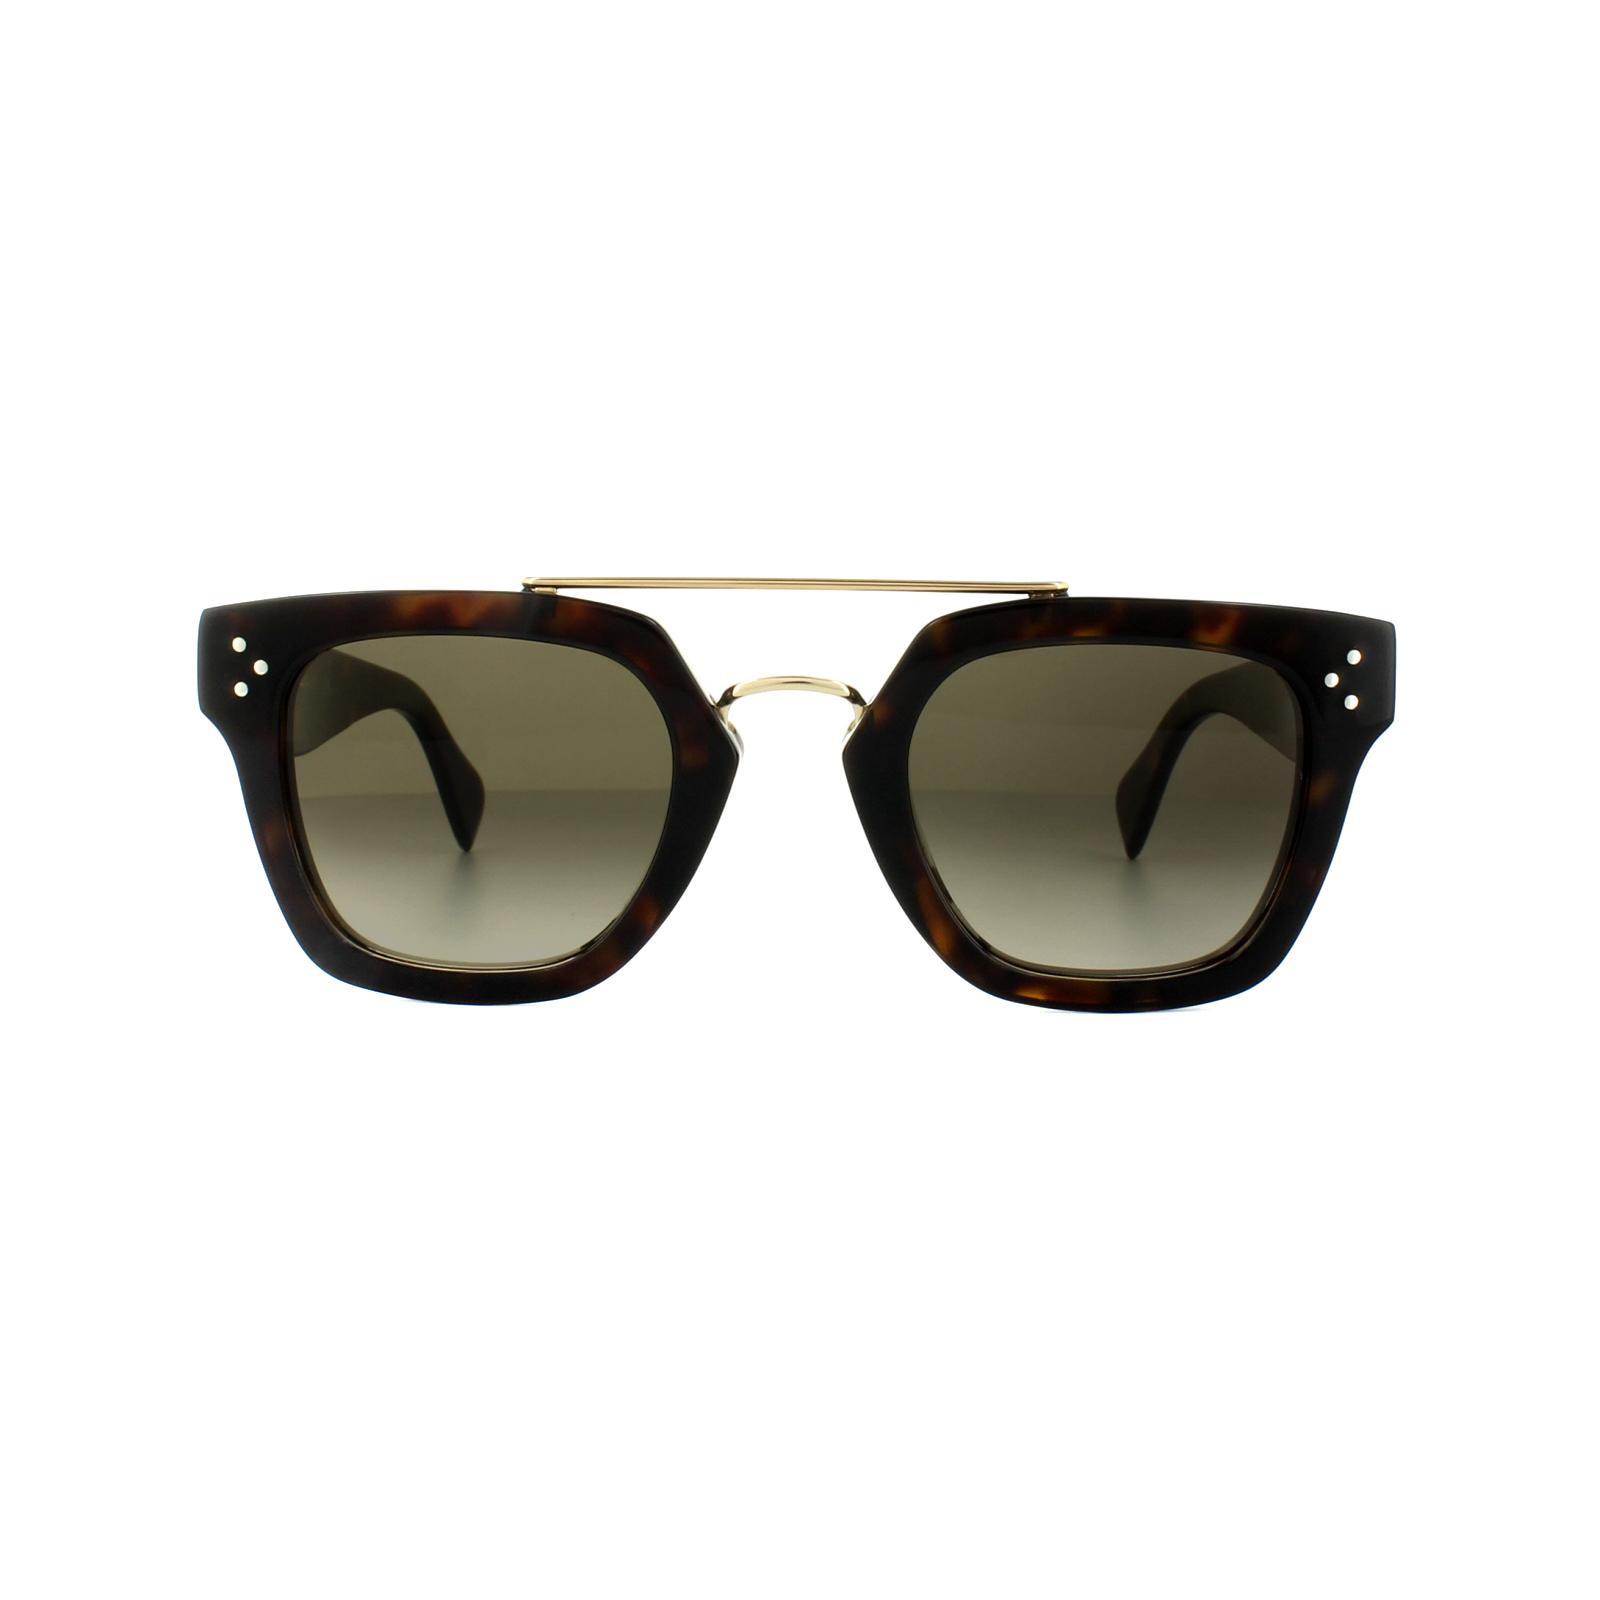 f2f2a9c8559 Sentinel Celine Sunglasses 41077 S Bridge 086 Z3 Havana Green Gradient